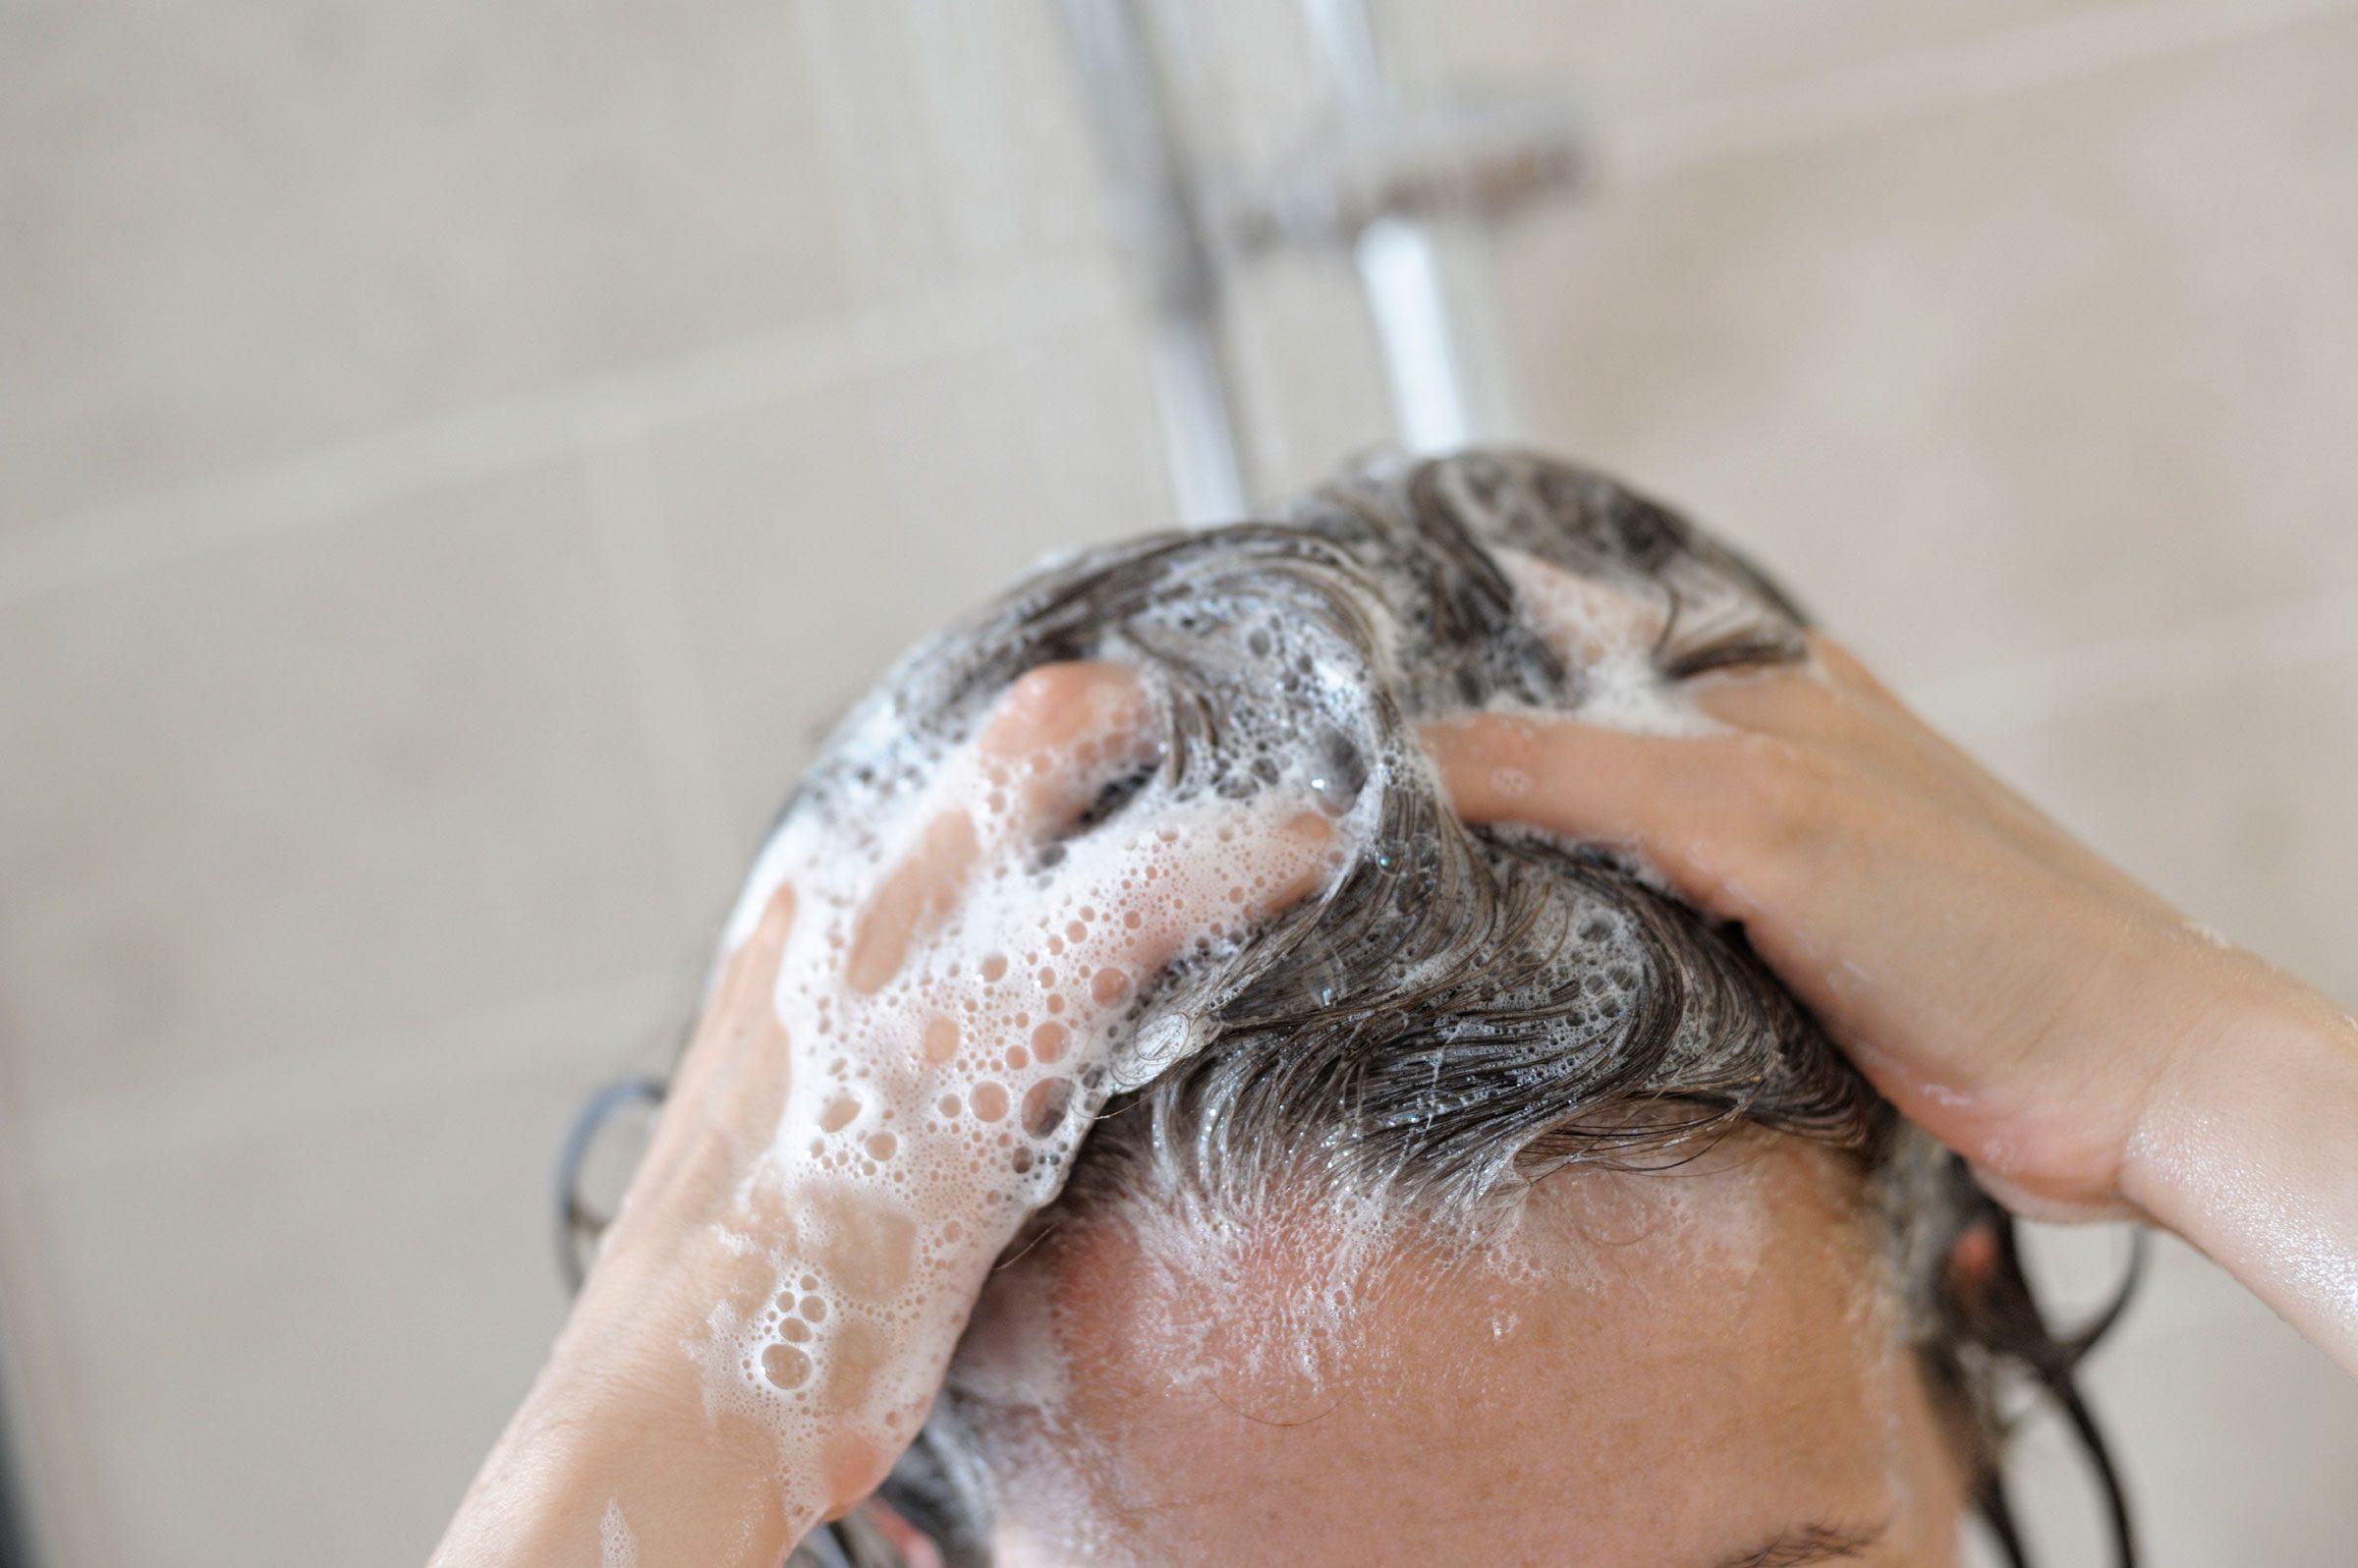 05-over-60-ways-to-use-salt-shampooing